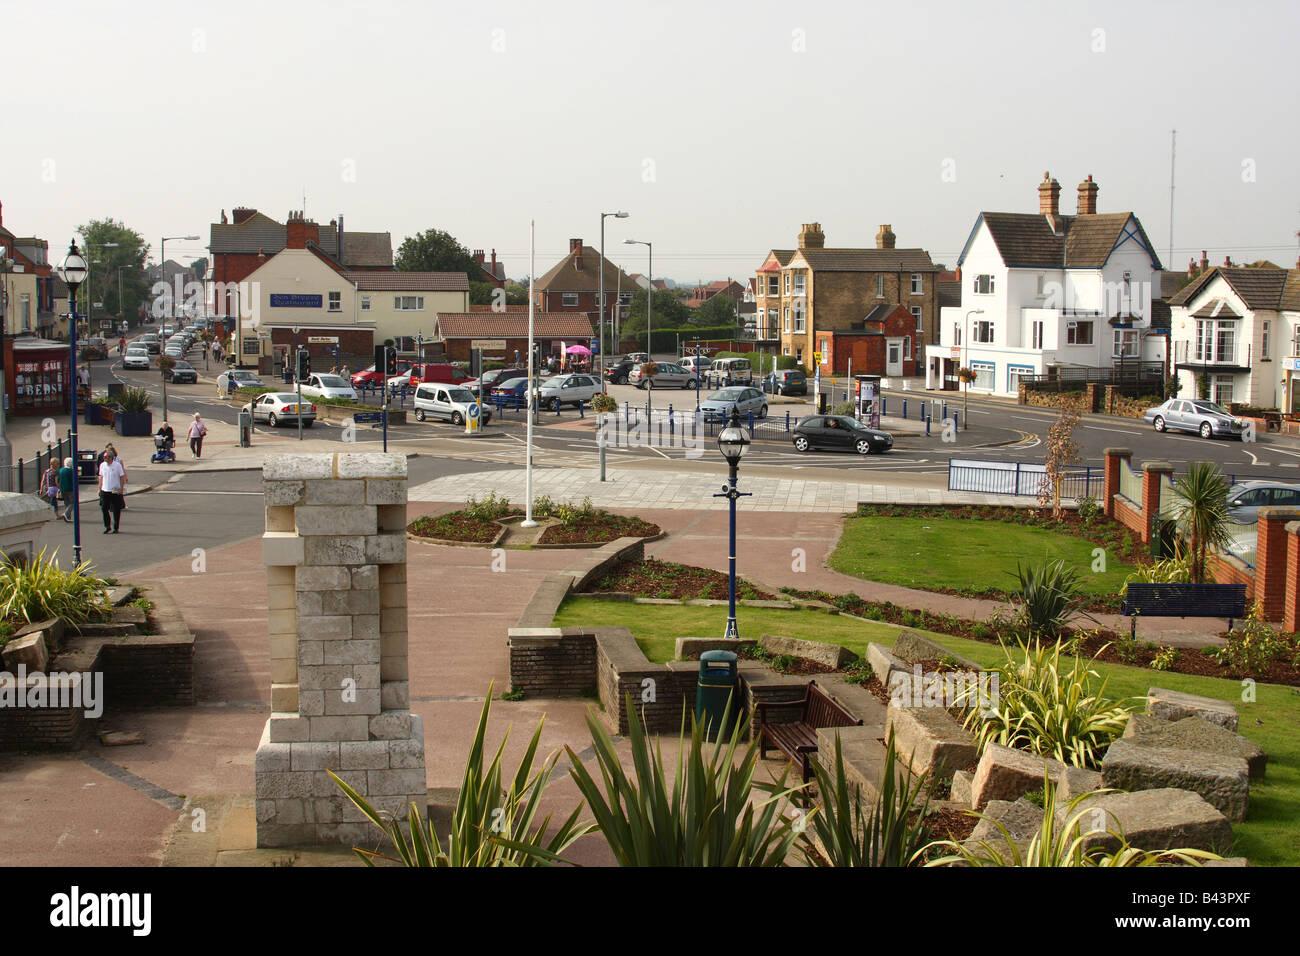 Sutton On Sea, Lincolnshire, England, U.K. Stock Photo